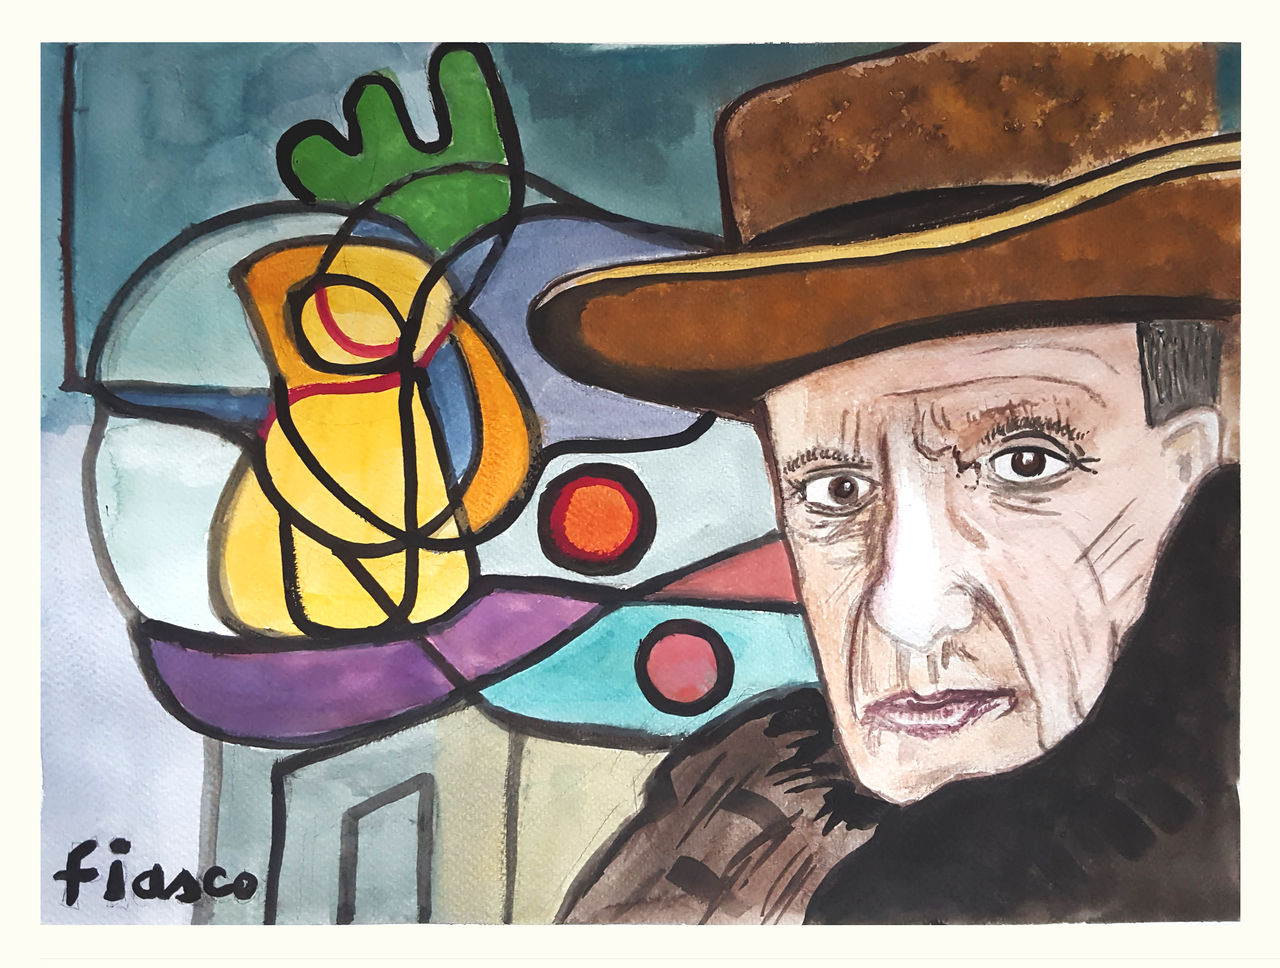 FIASCO Pablo Picasso